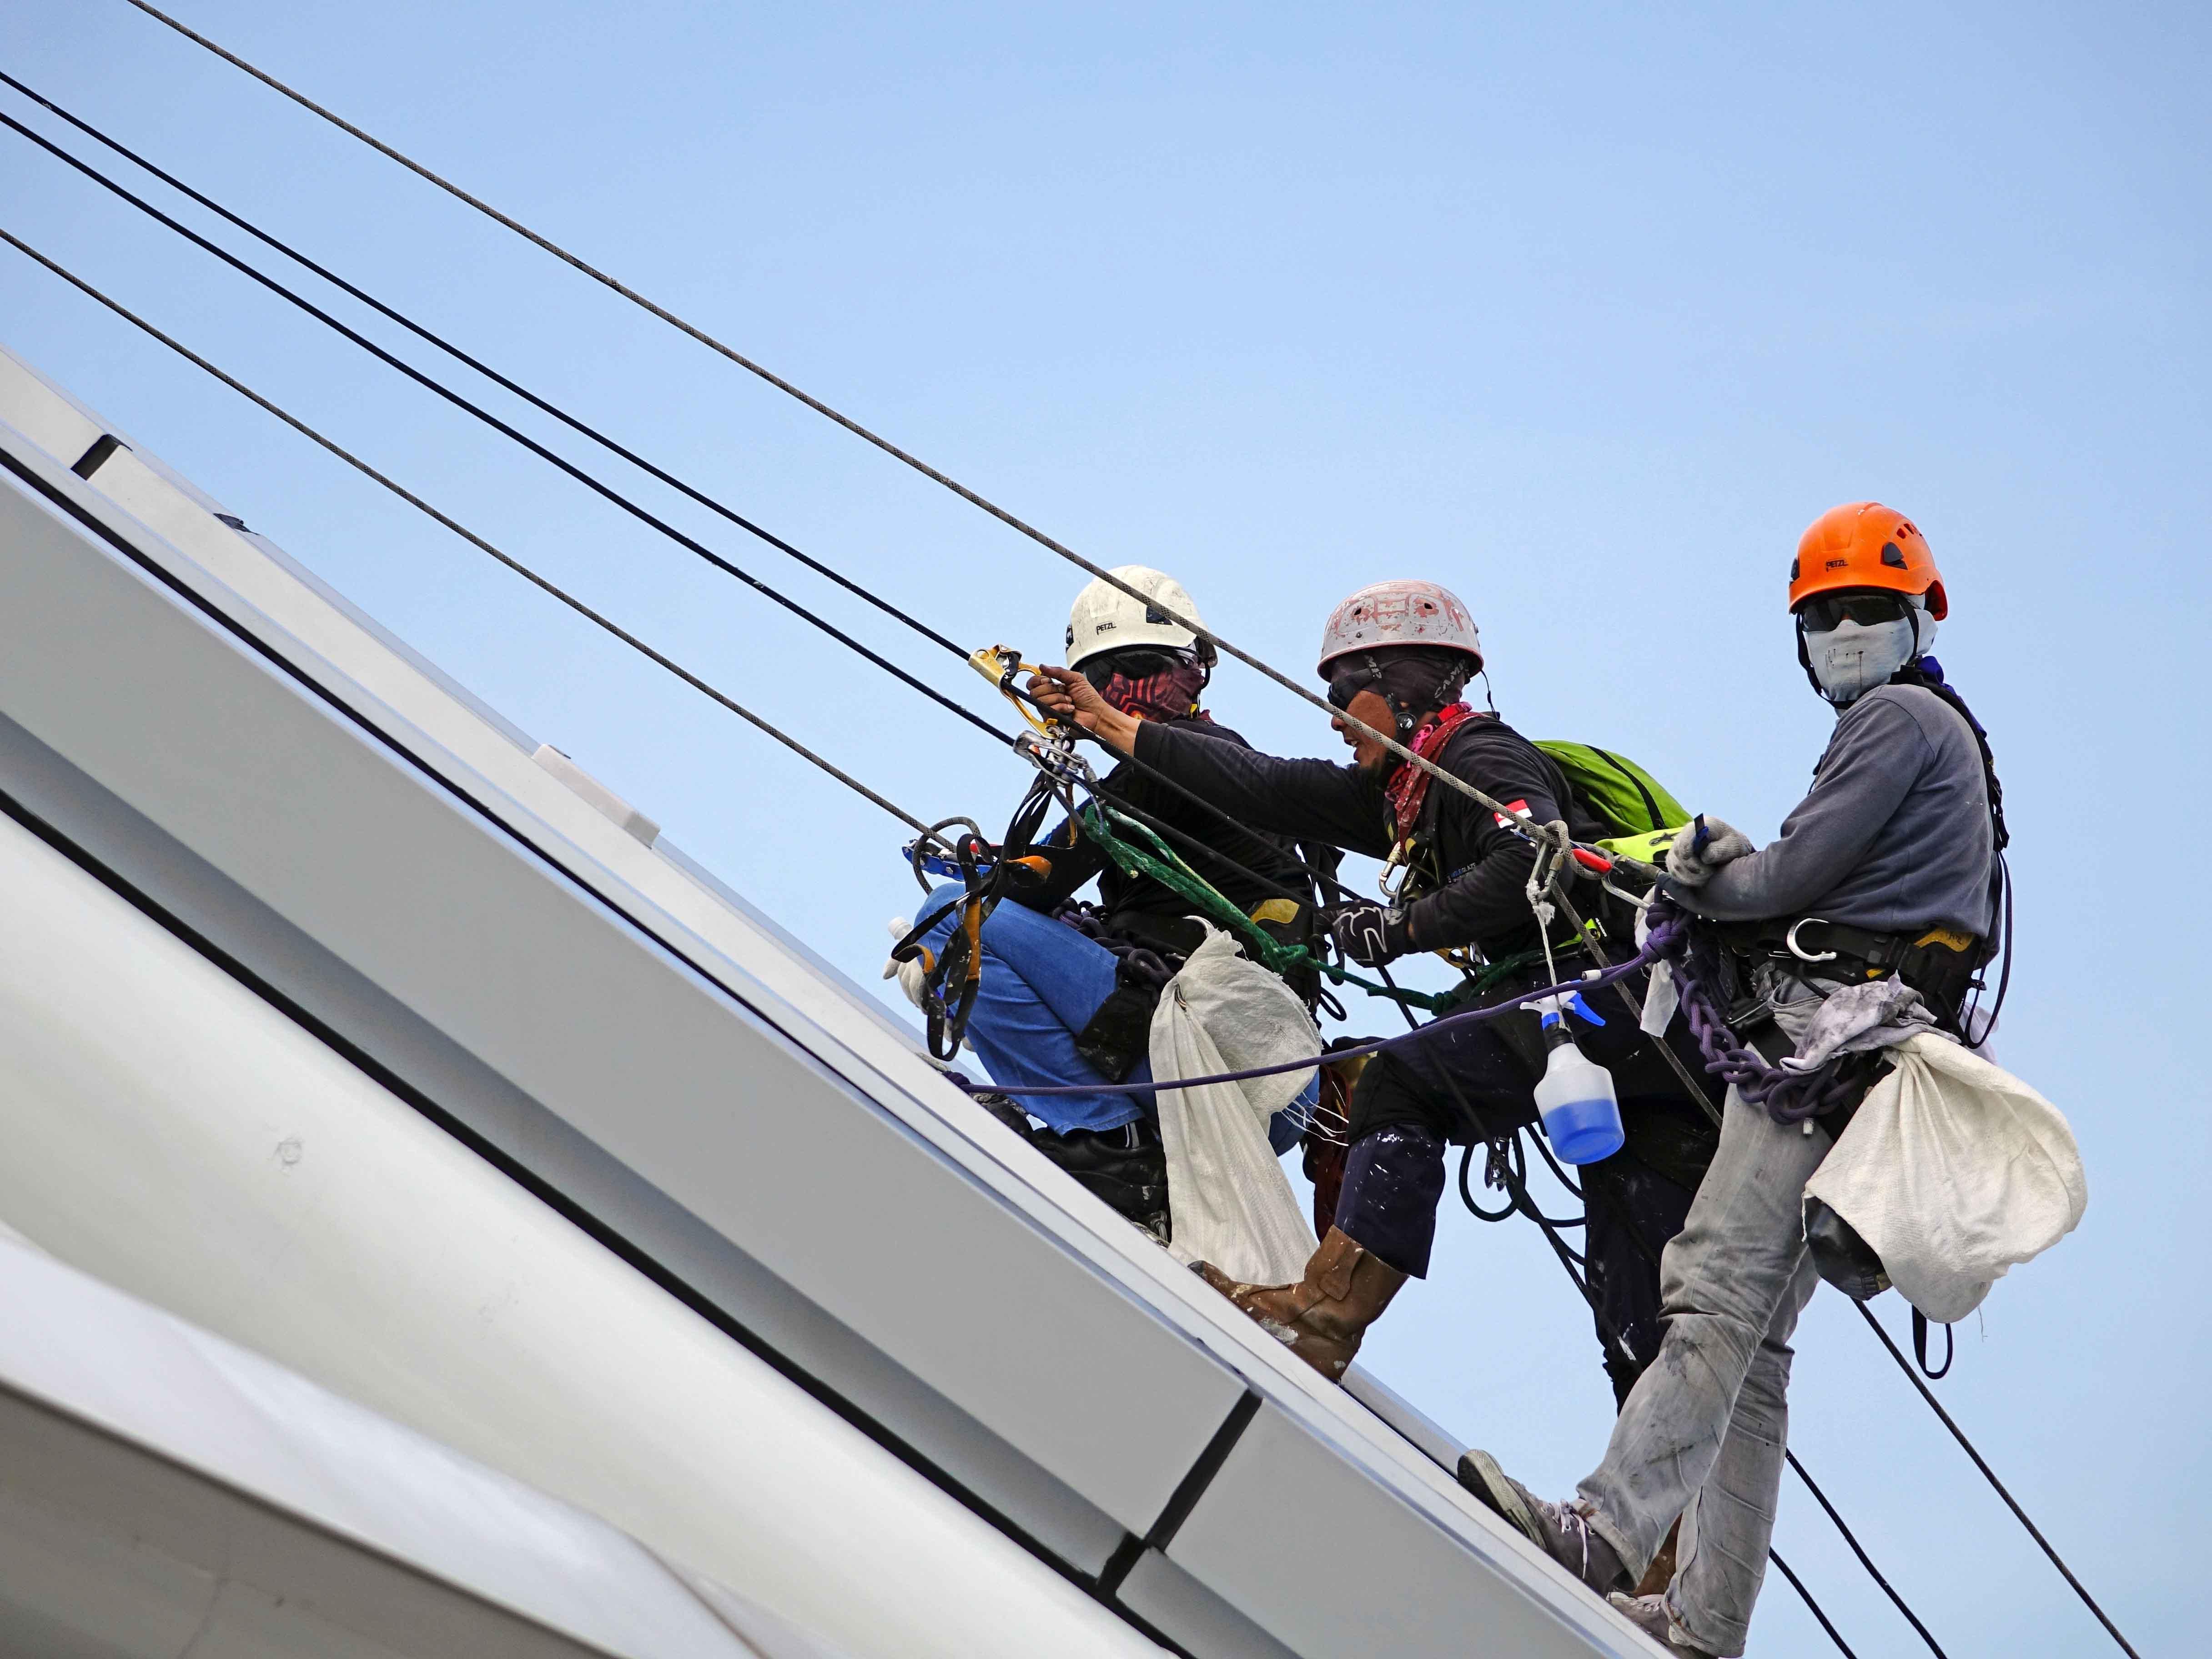 obreros colgados de arnés en fachada de edificio